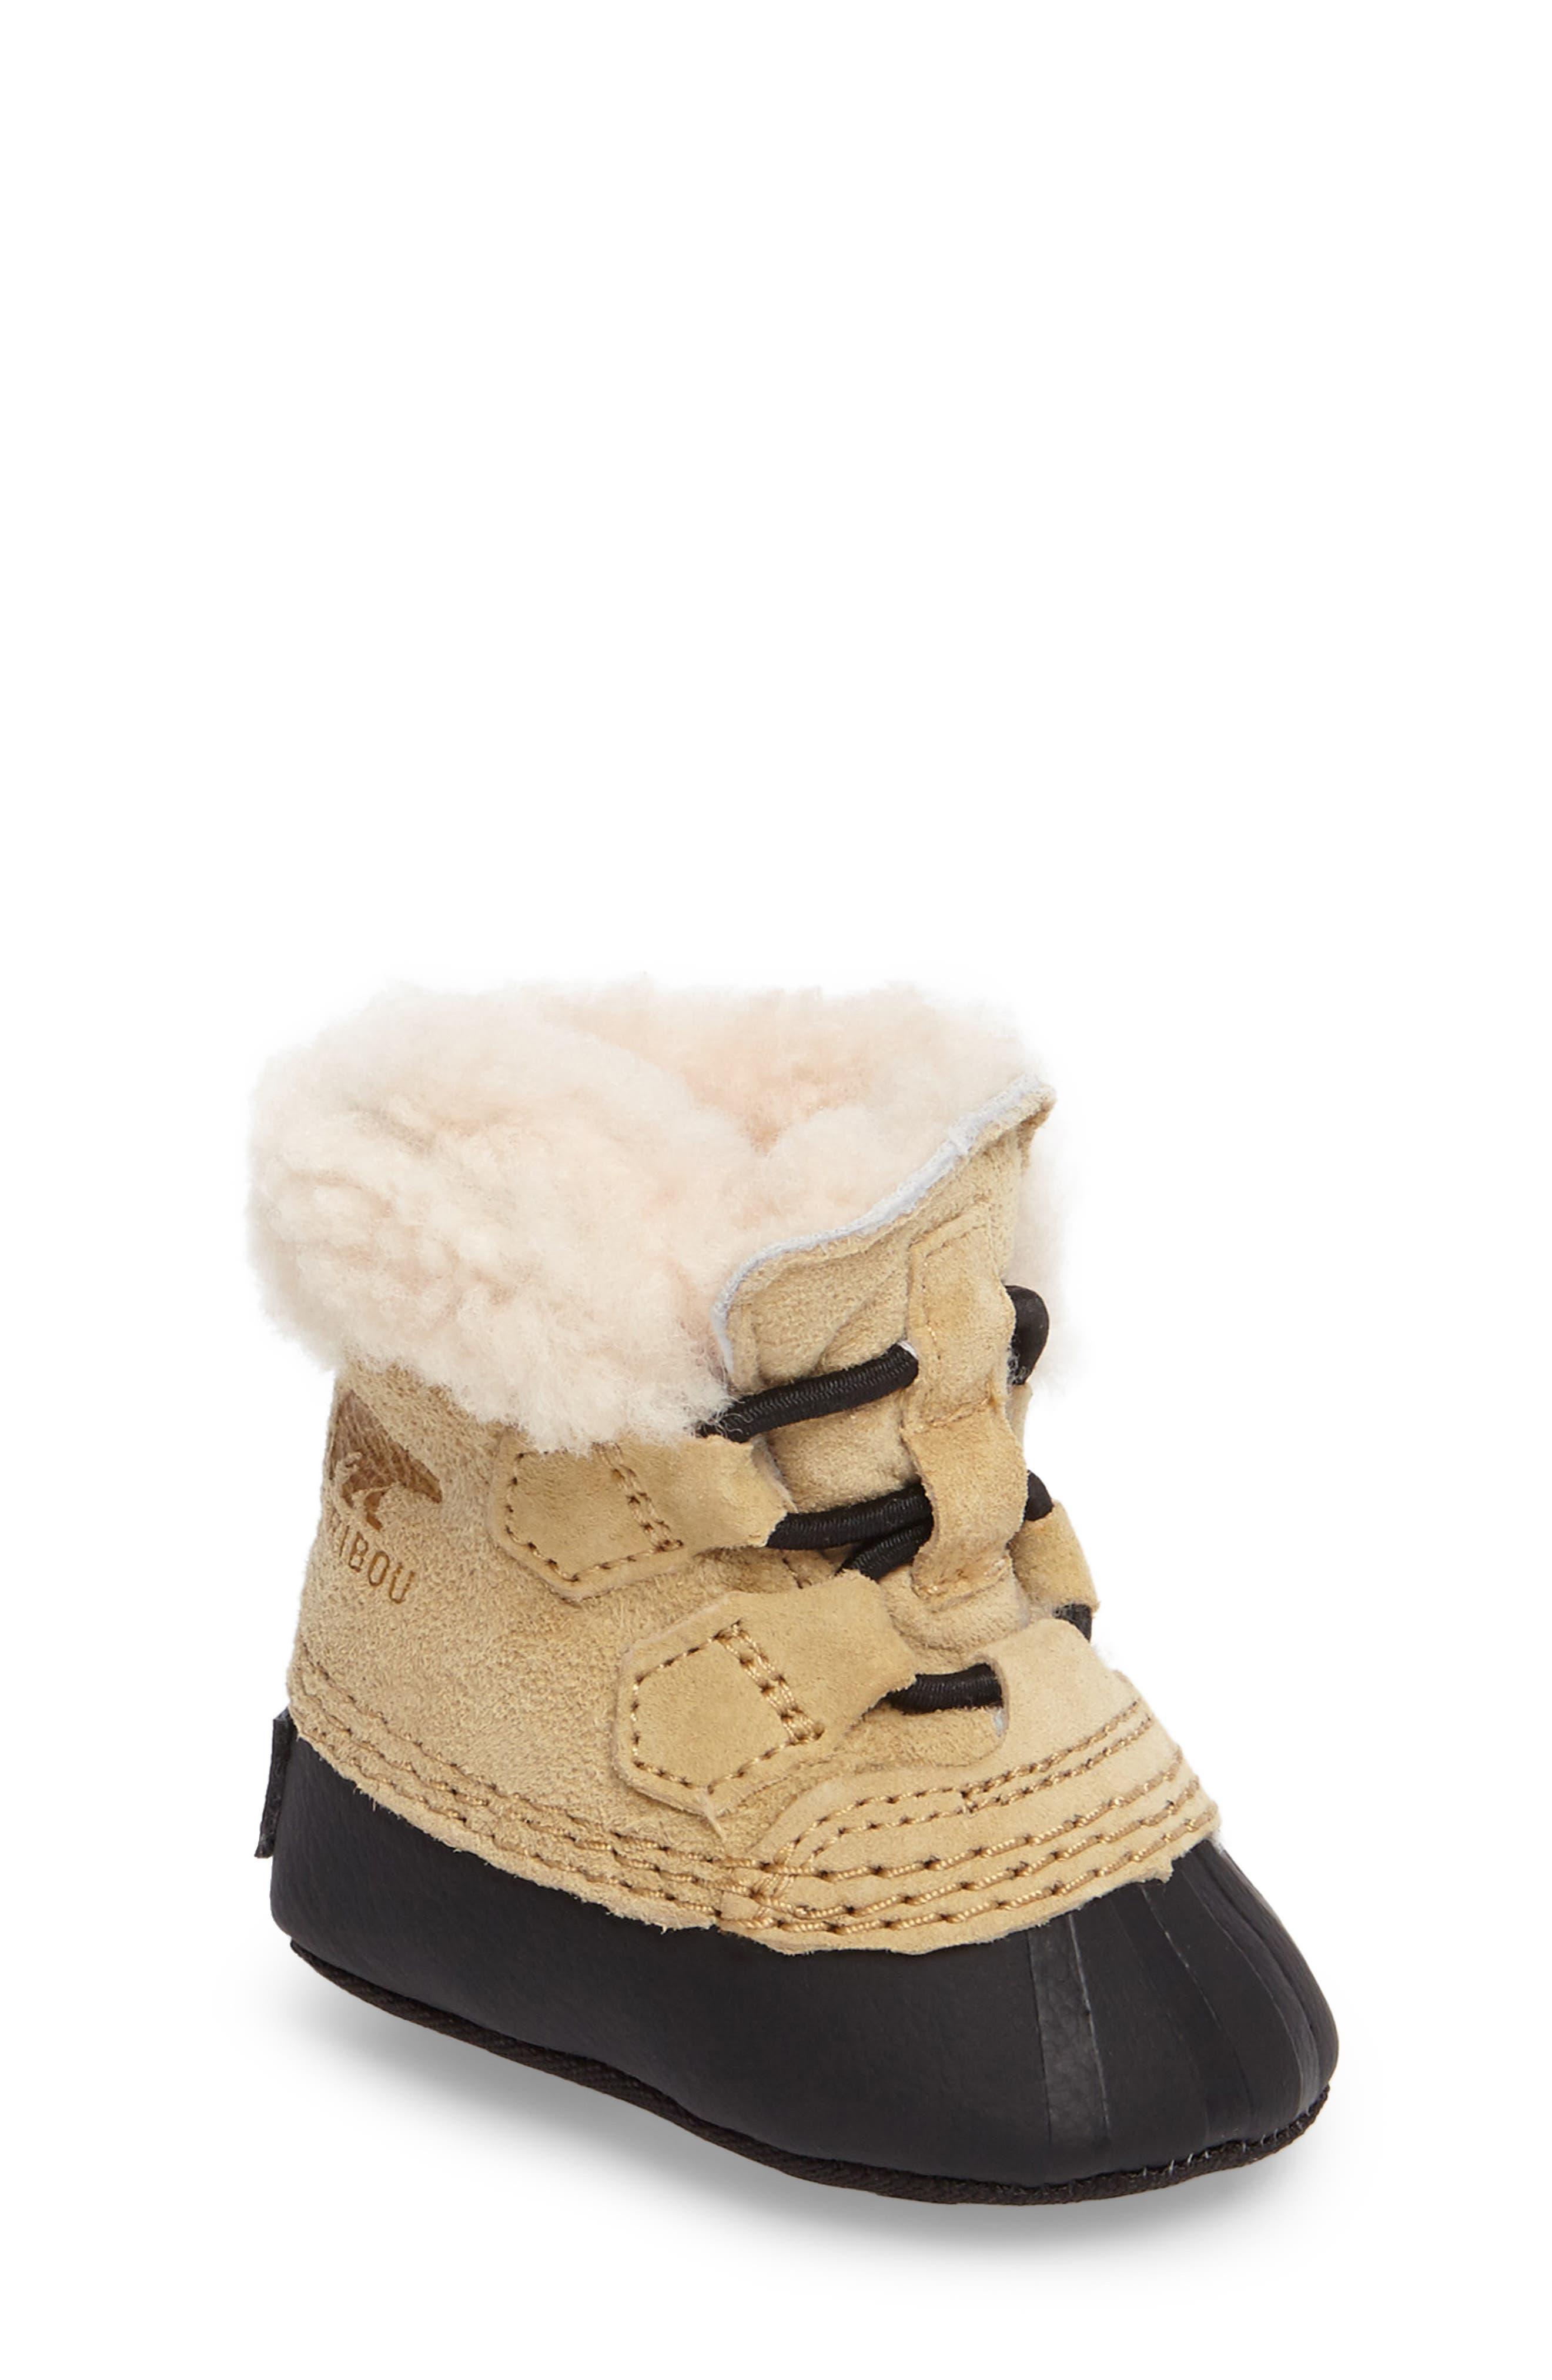 Alternate Image 1 Selected - SOREL Caribootie Genuine Shearling Crib Shoe (Baby)